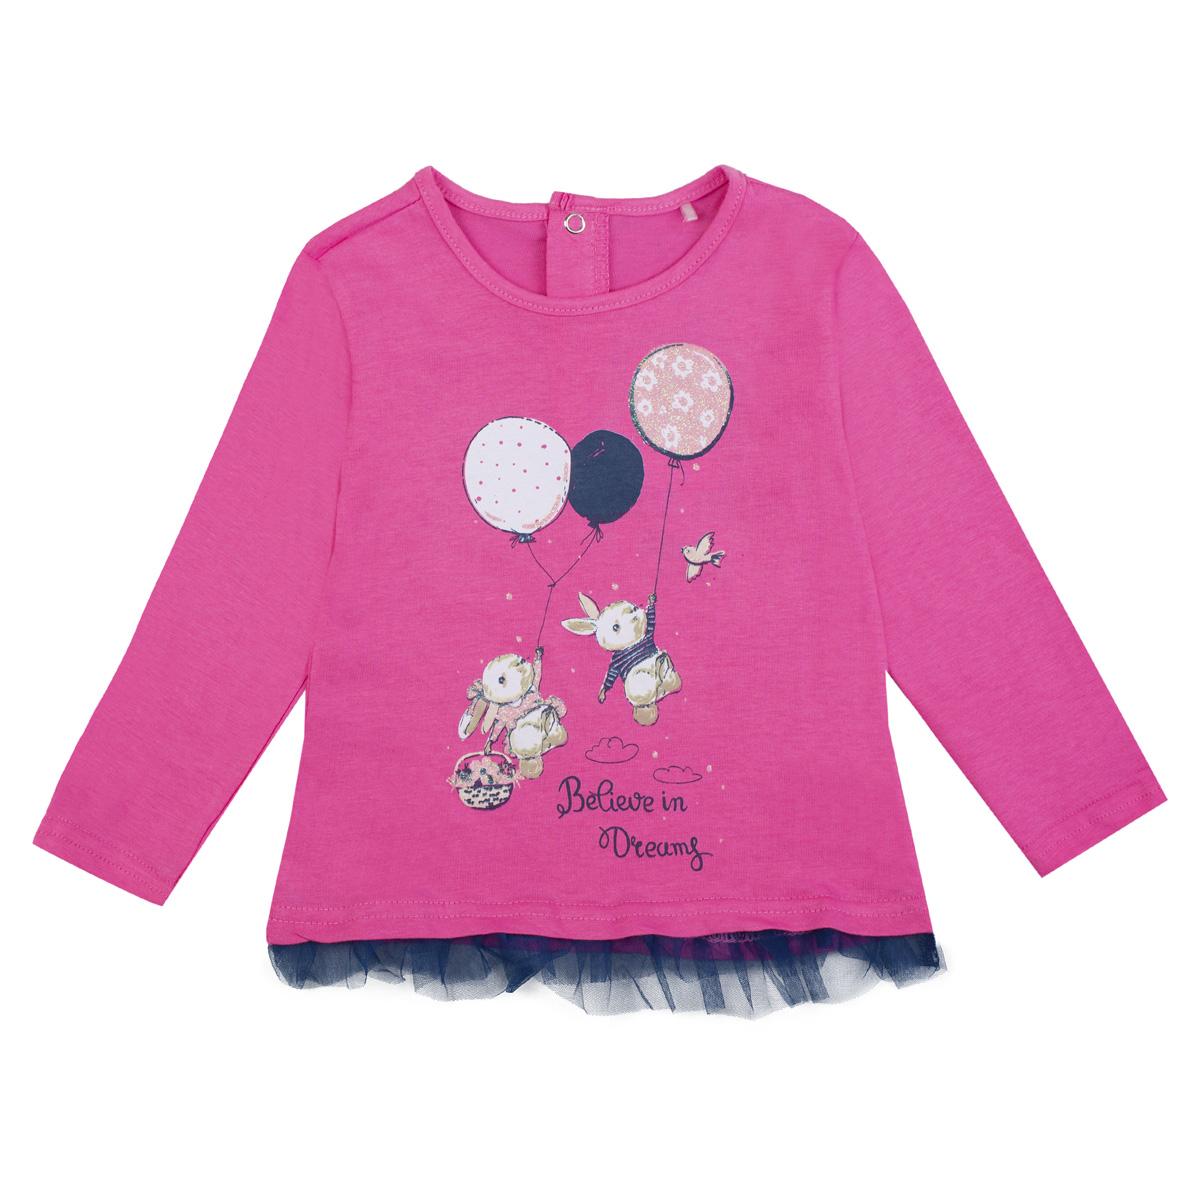 Baby majica, roza